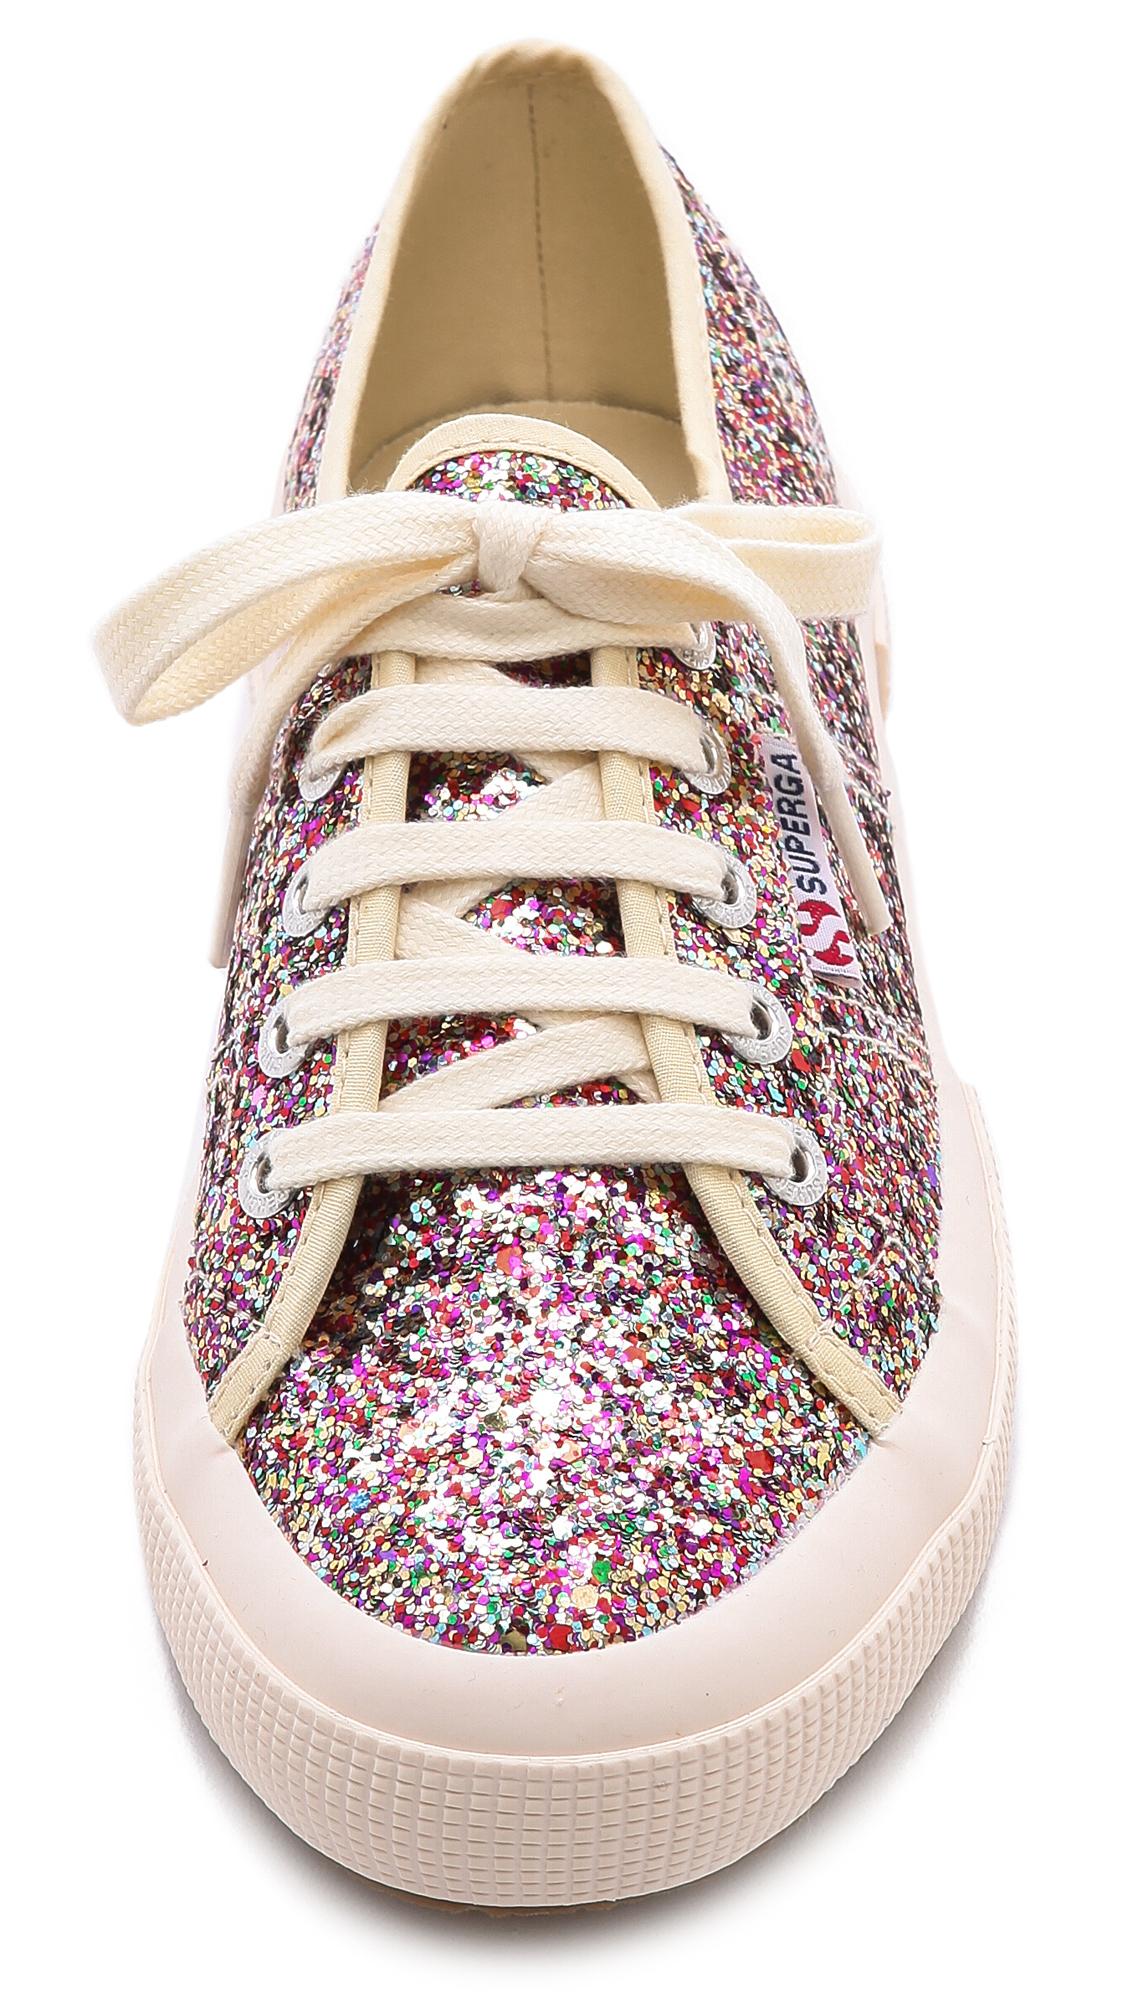 Superga Glitter Sneakers - Multi - Lyst